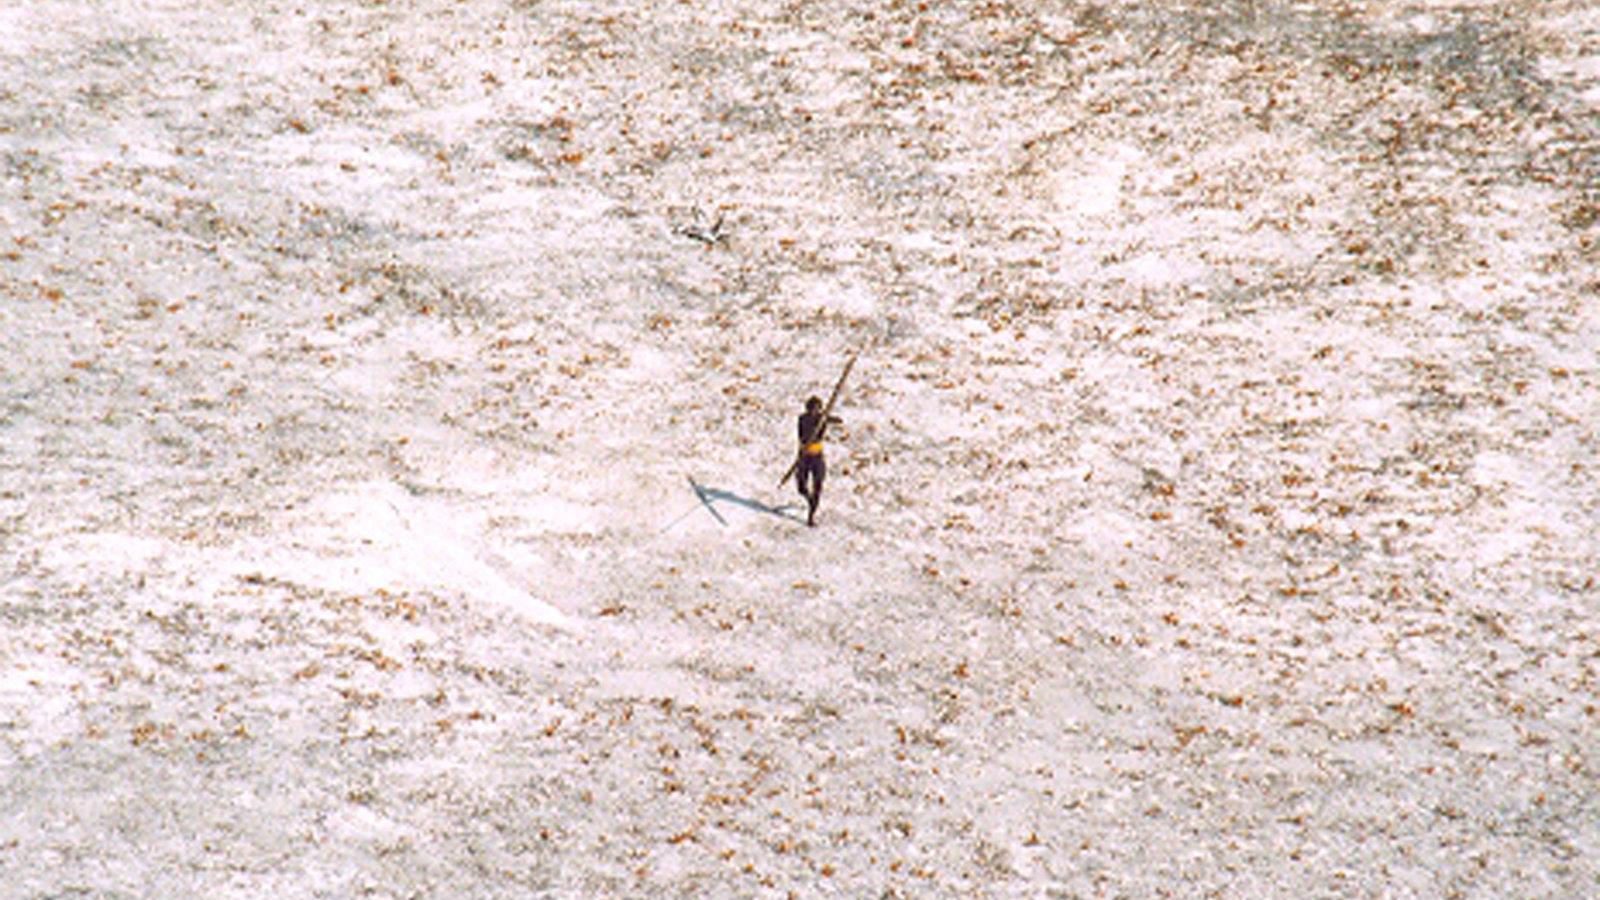 Andaman's Sentinelese who killed John Chau weren't always hostile